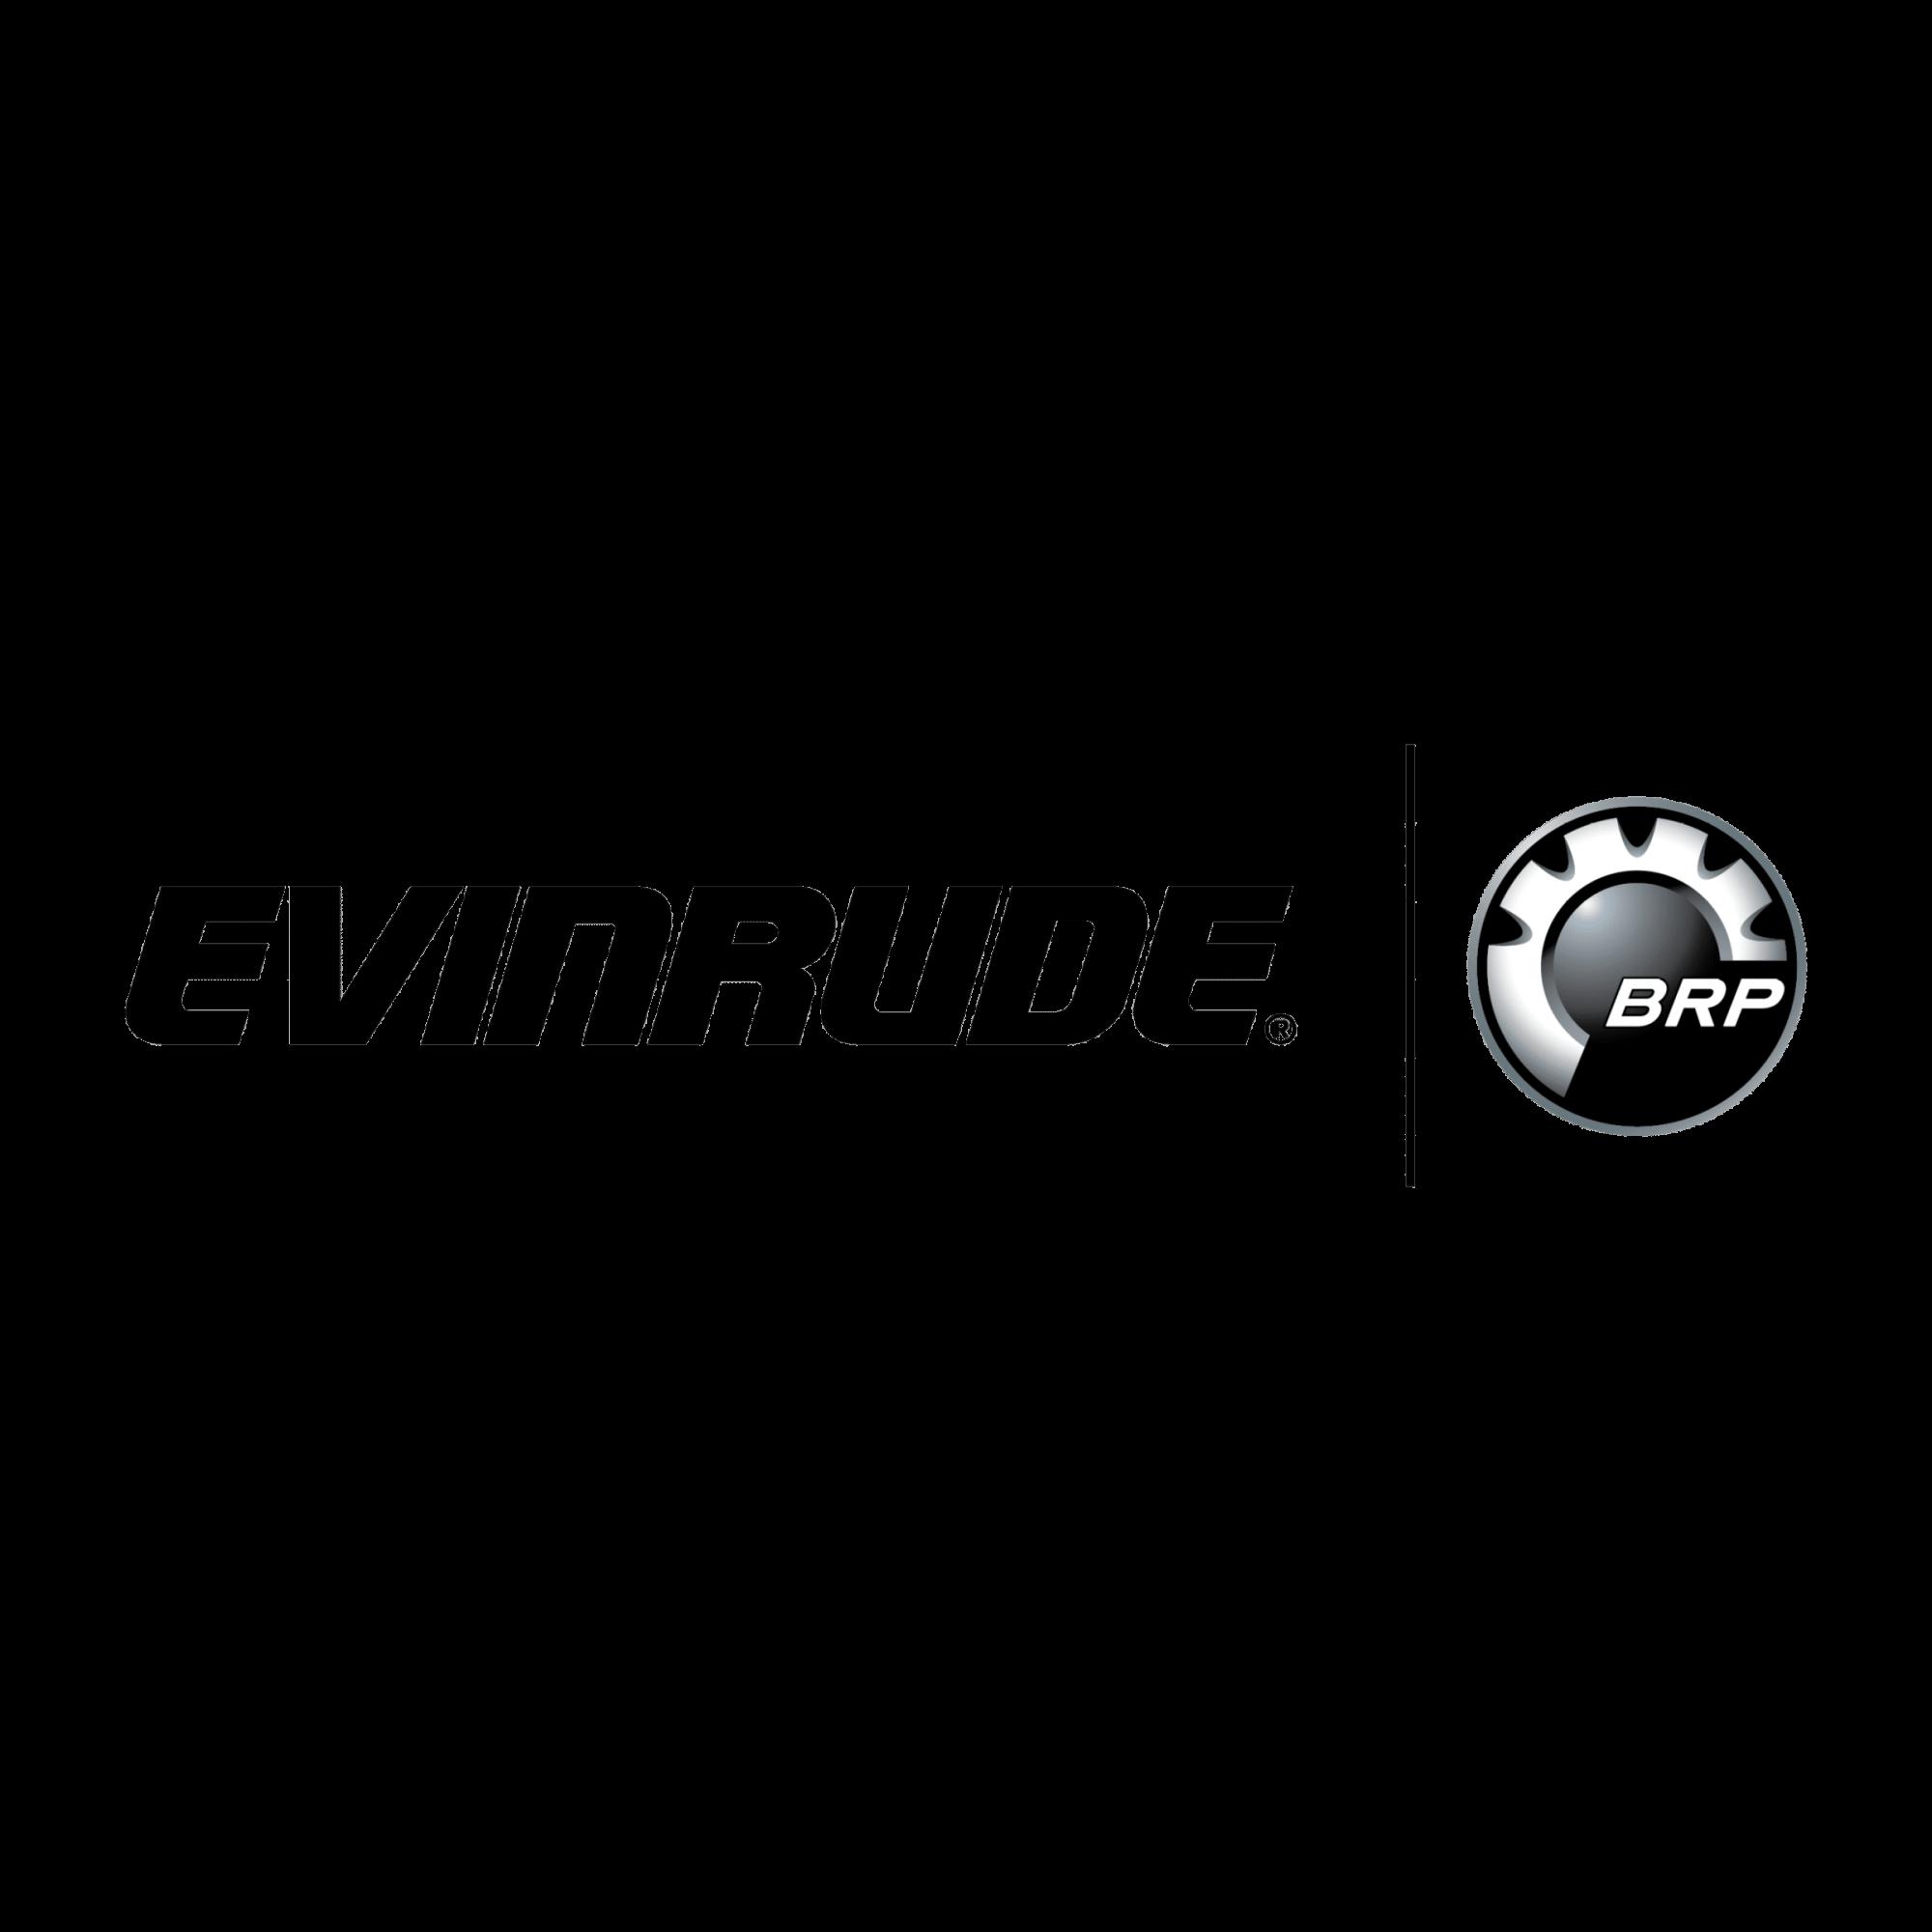 Evinrude 115HP E-TEC G2 H.O. - EVINRUDELOGO